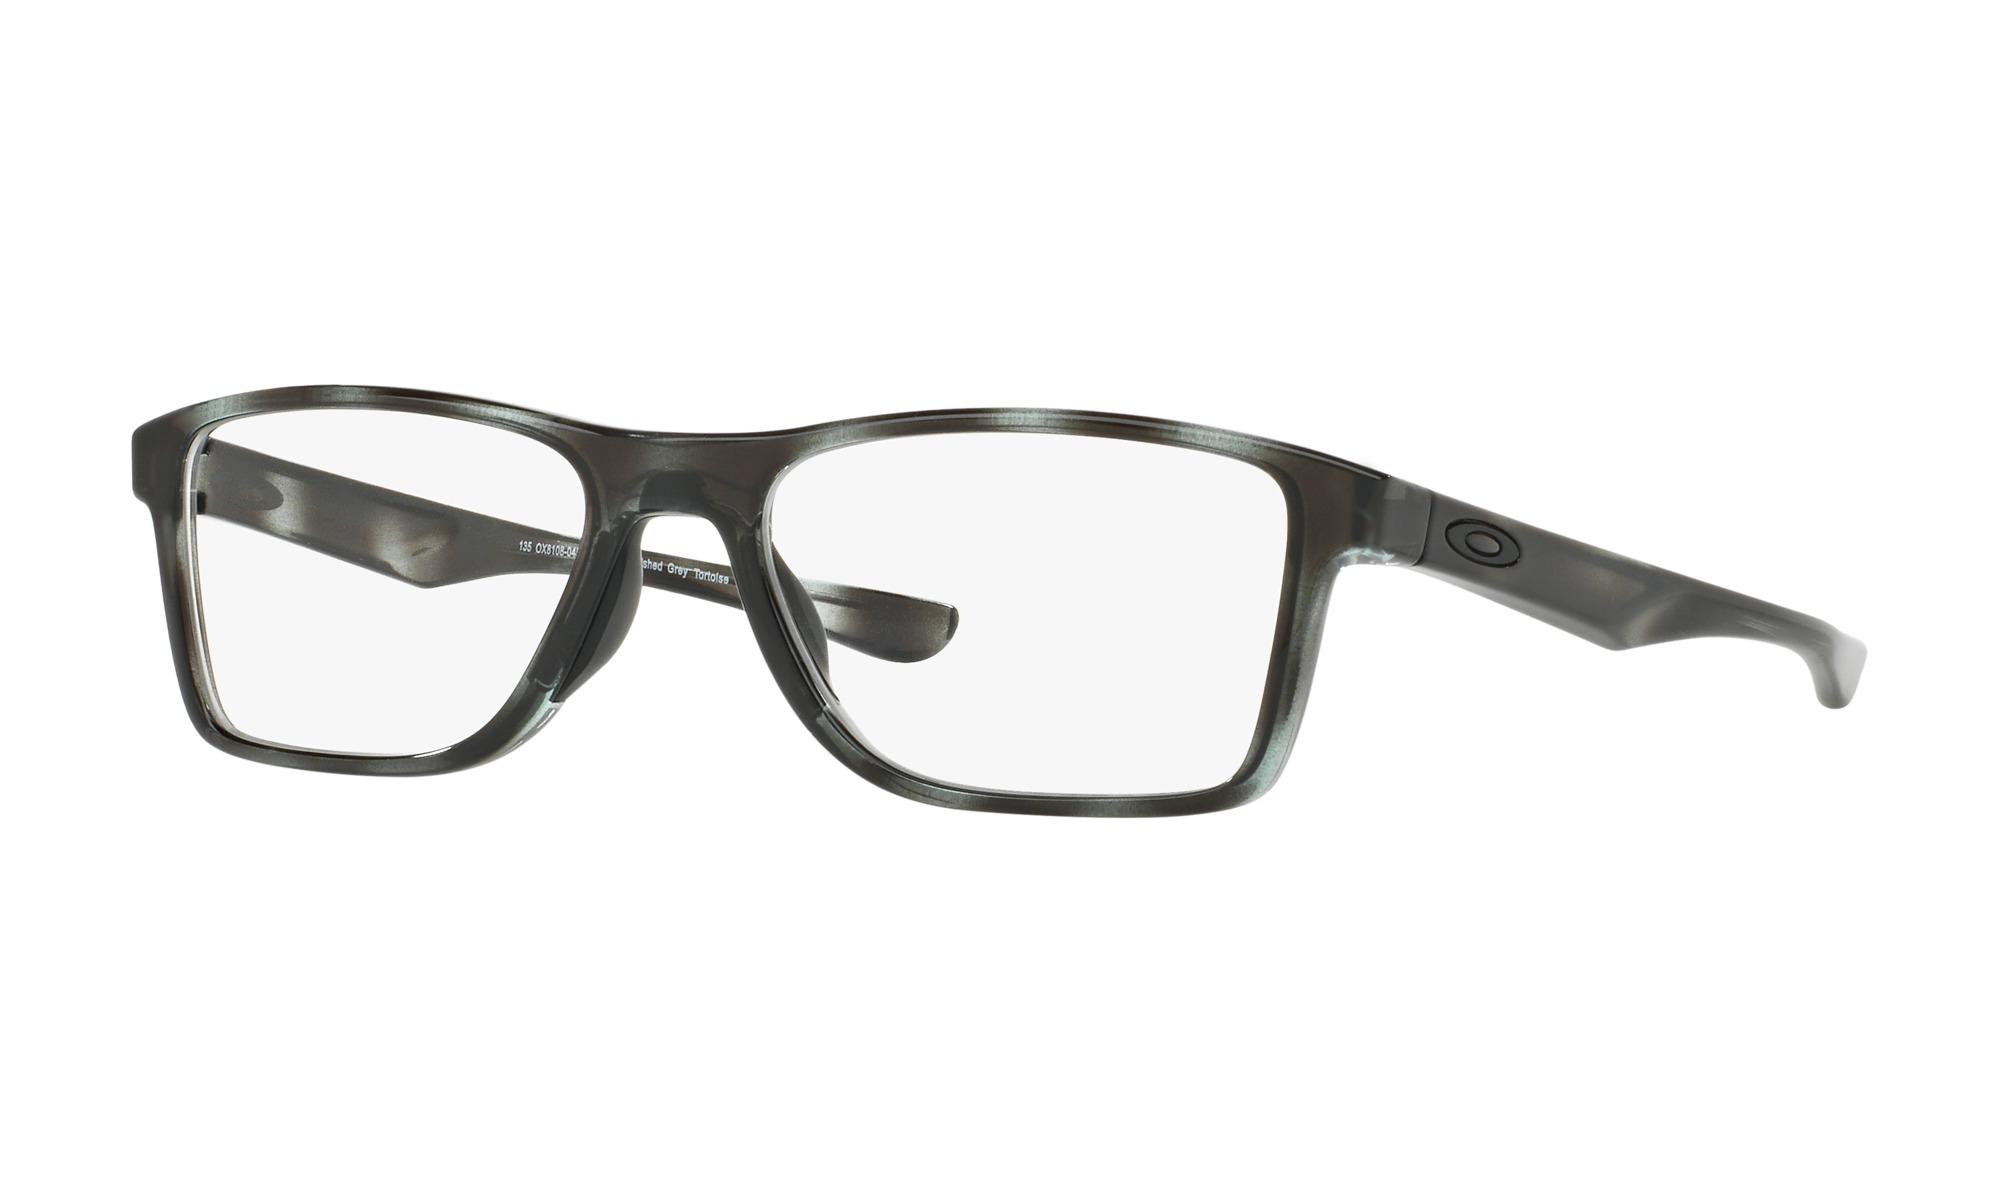 Gọng kính Oakley OX8108-04